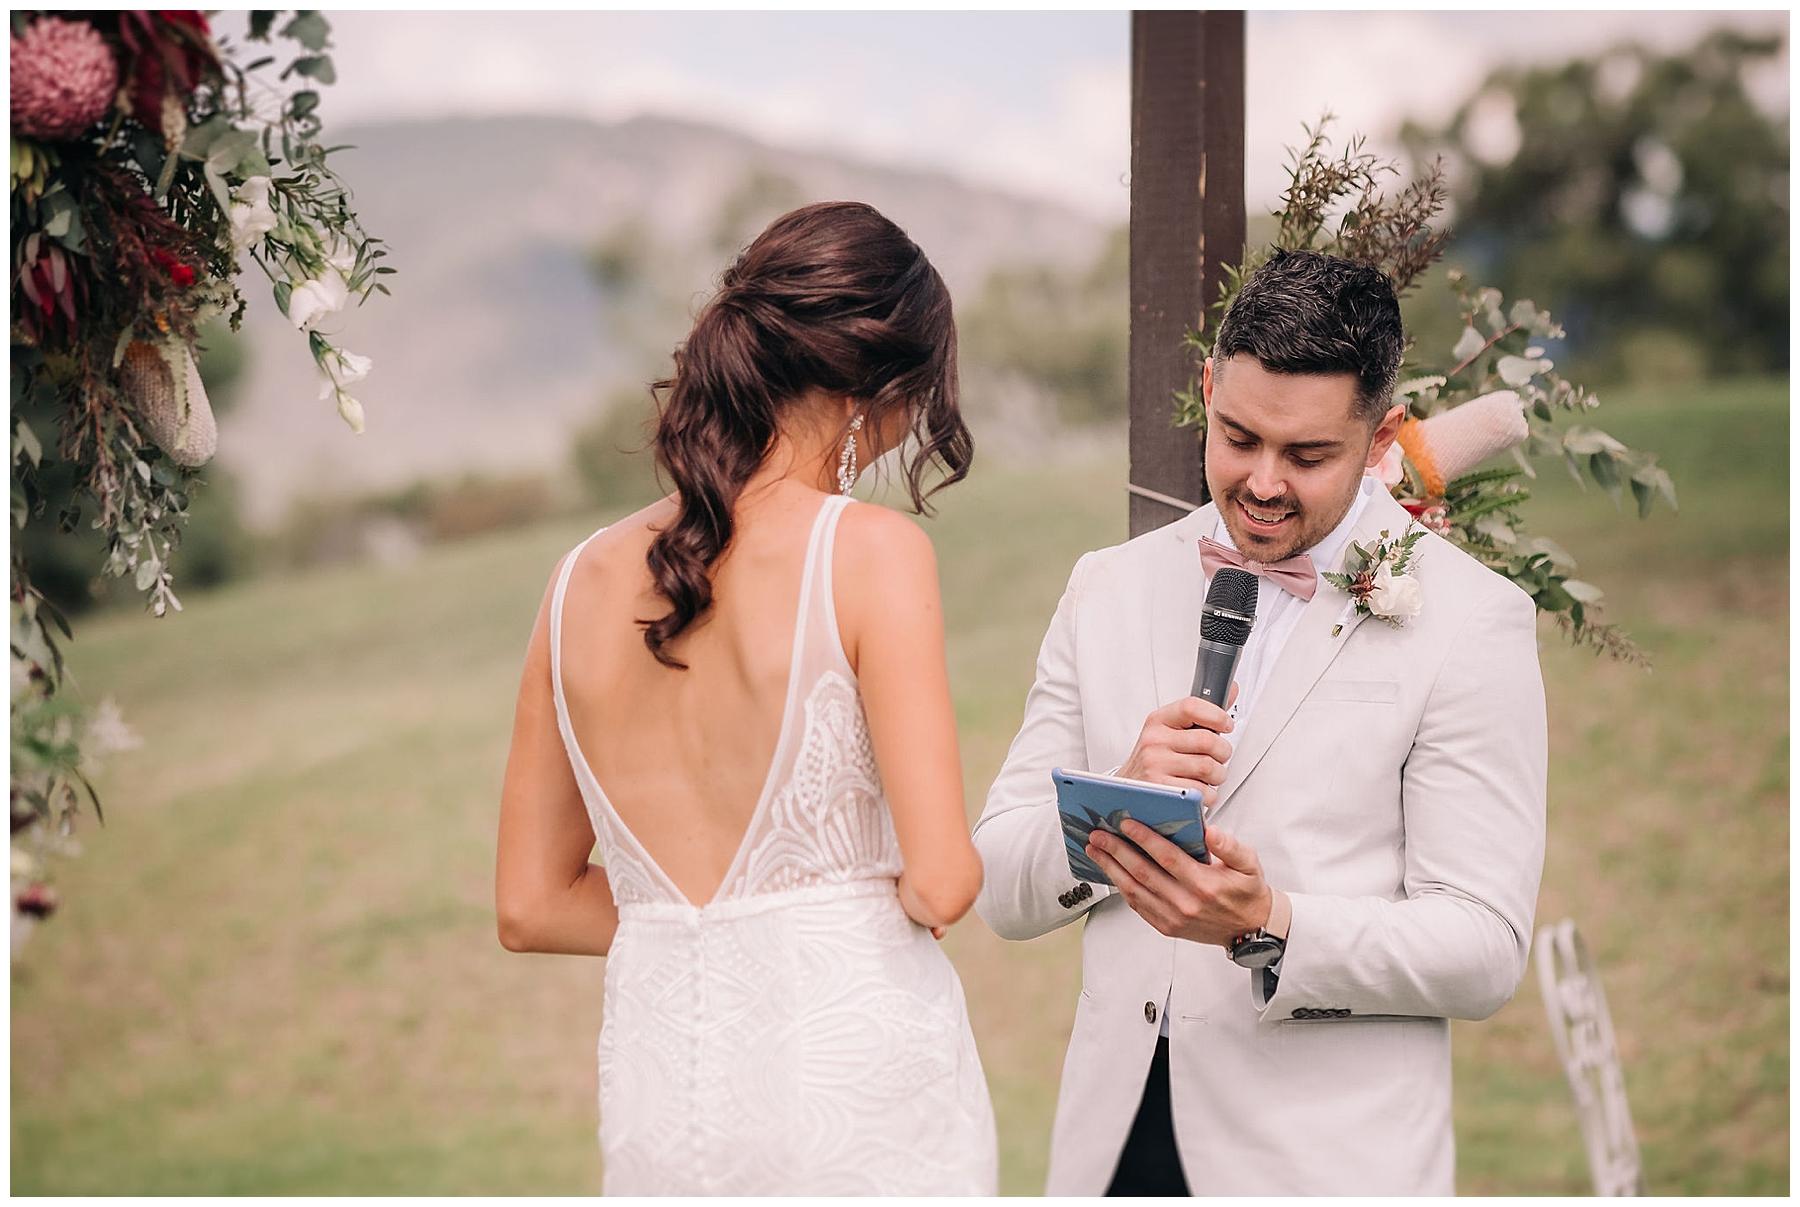 Adam's Peak Wedding Photos + Popcorn Photography_0025.jpg